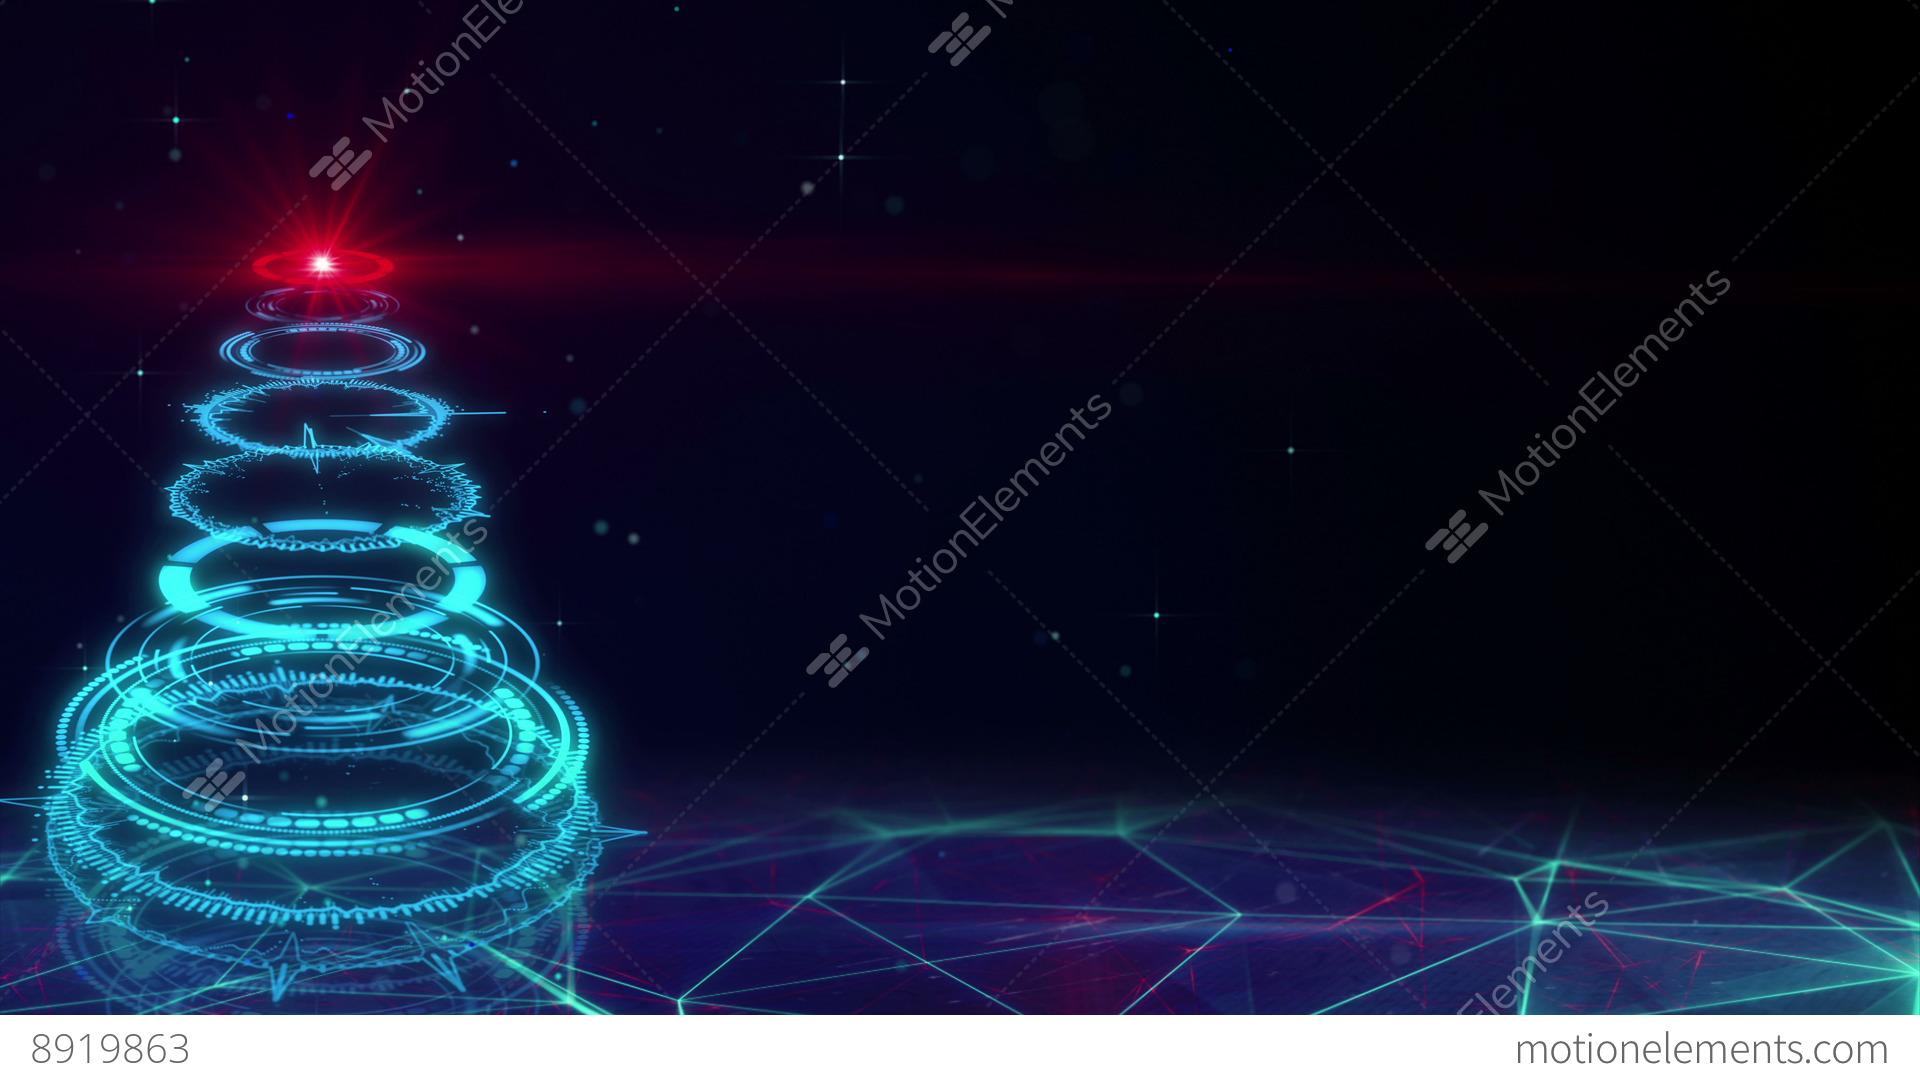 Blue Sci-fi Christmas Tree Loopable Animation 4k (4096x2304) Stock ...